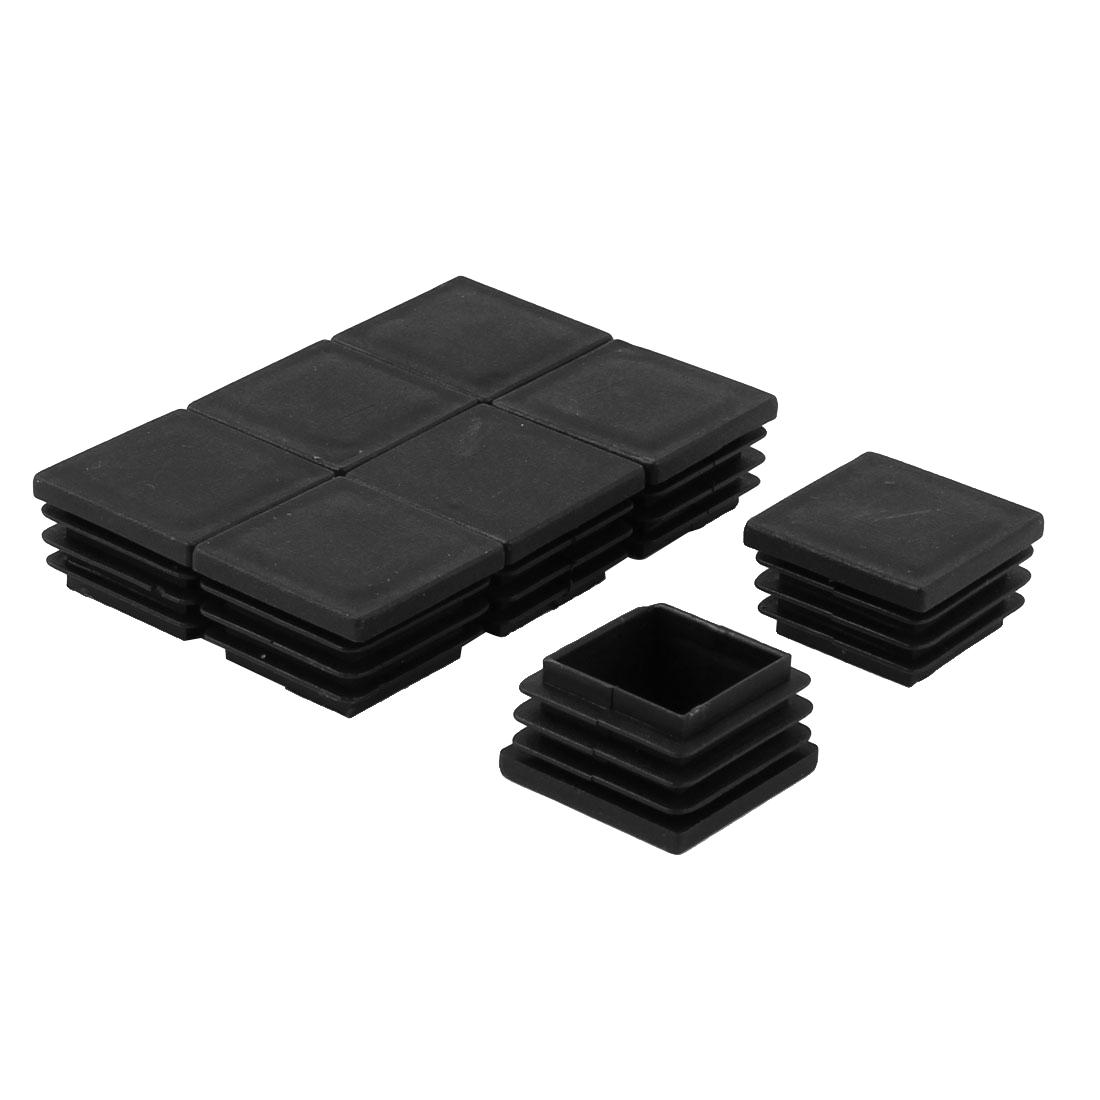 Desk Table Chair Feet Plastic Square Tube Pipe Inserts Black 30 x 30mm 8pcs